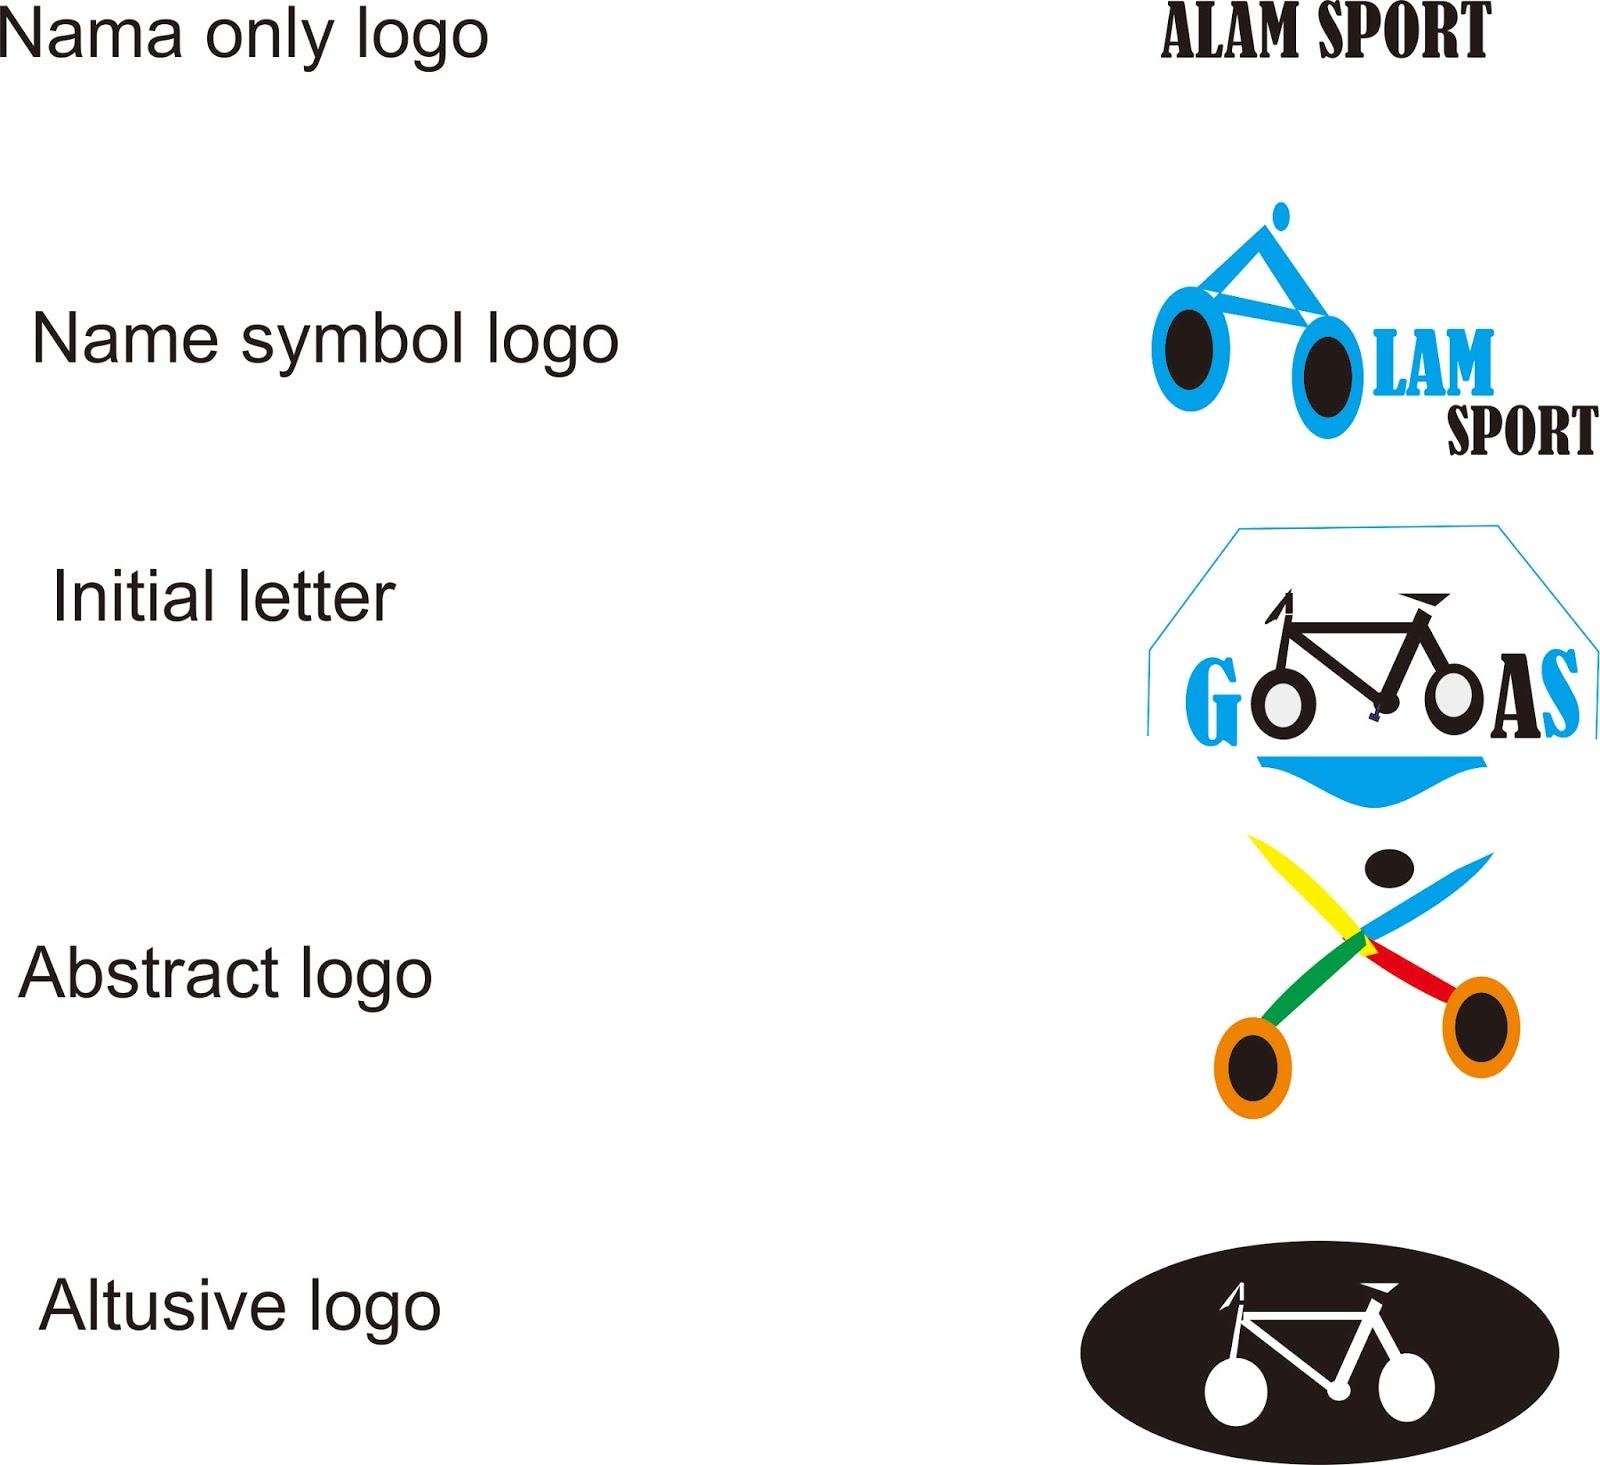 Contoh Logo Perusahaan Pengiriman Dan Produk Olahraga